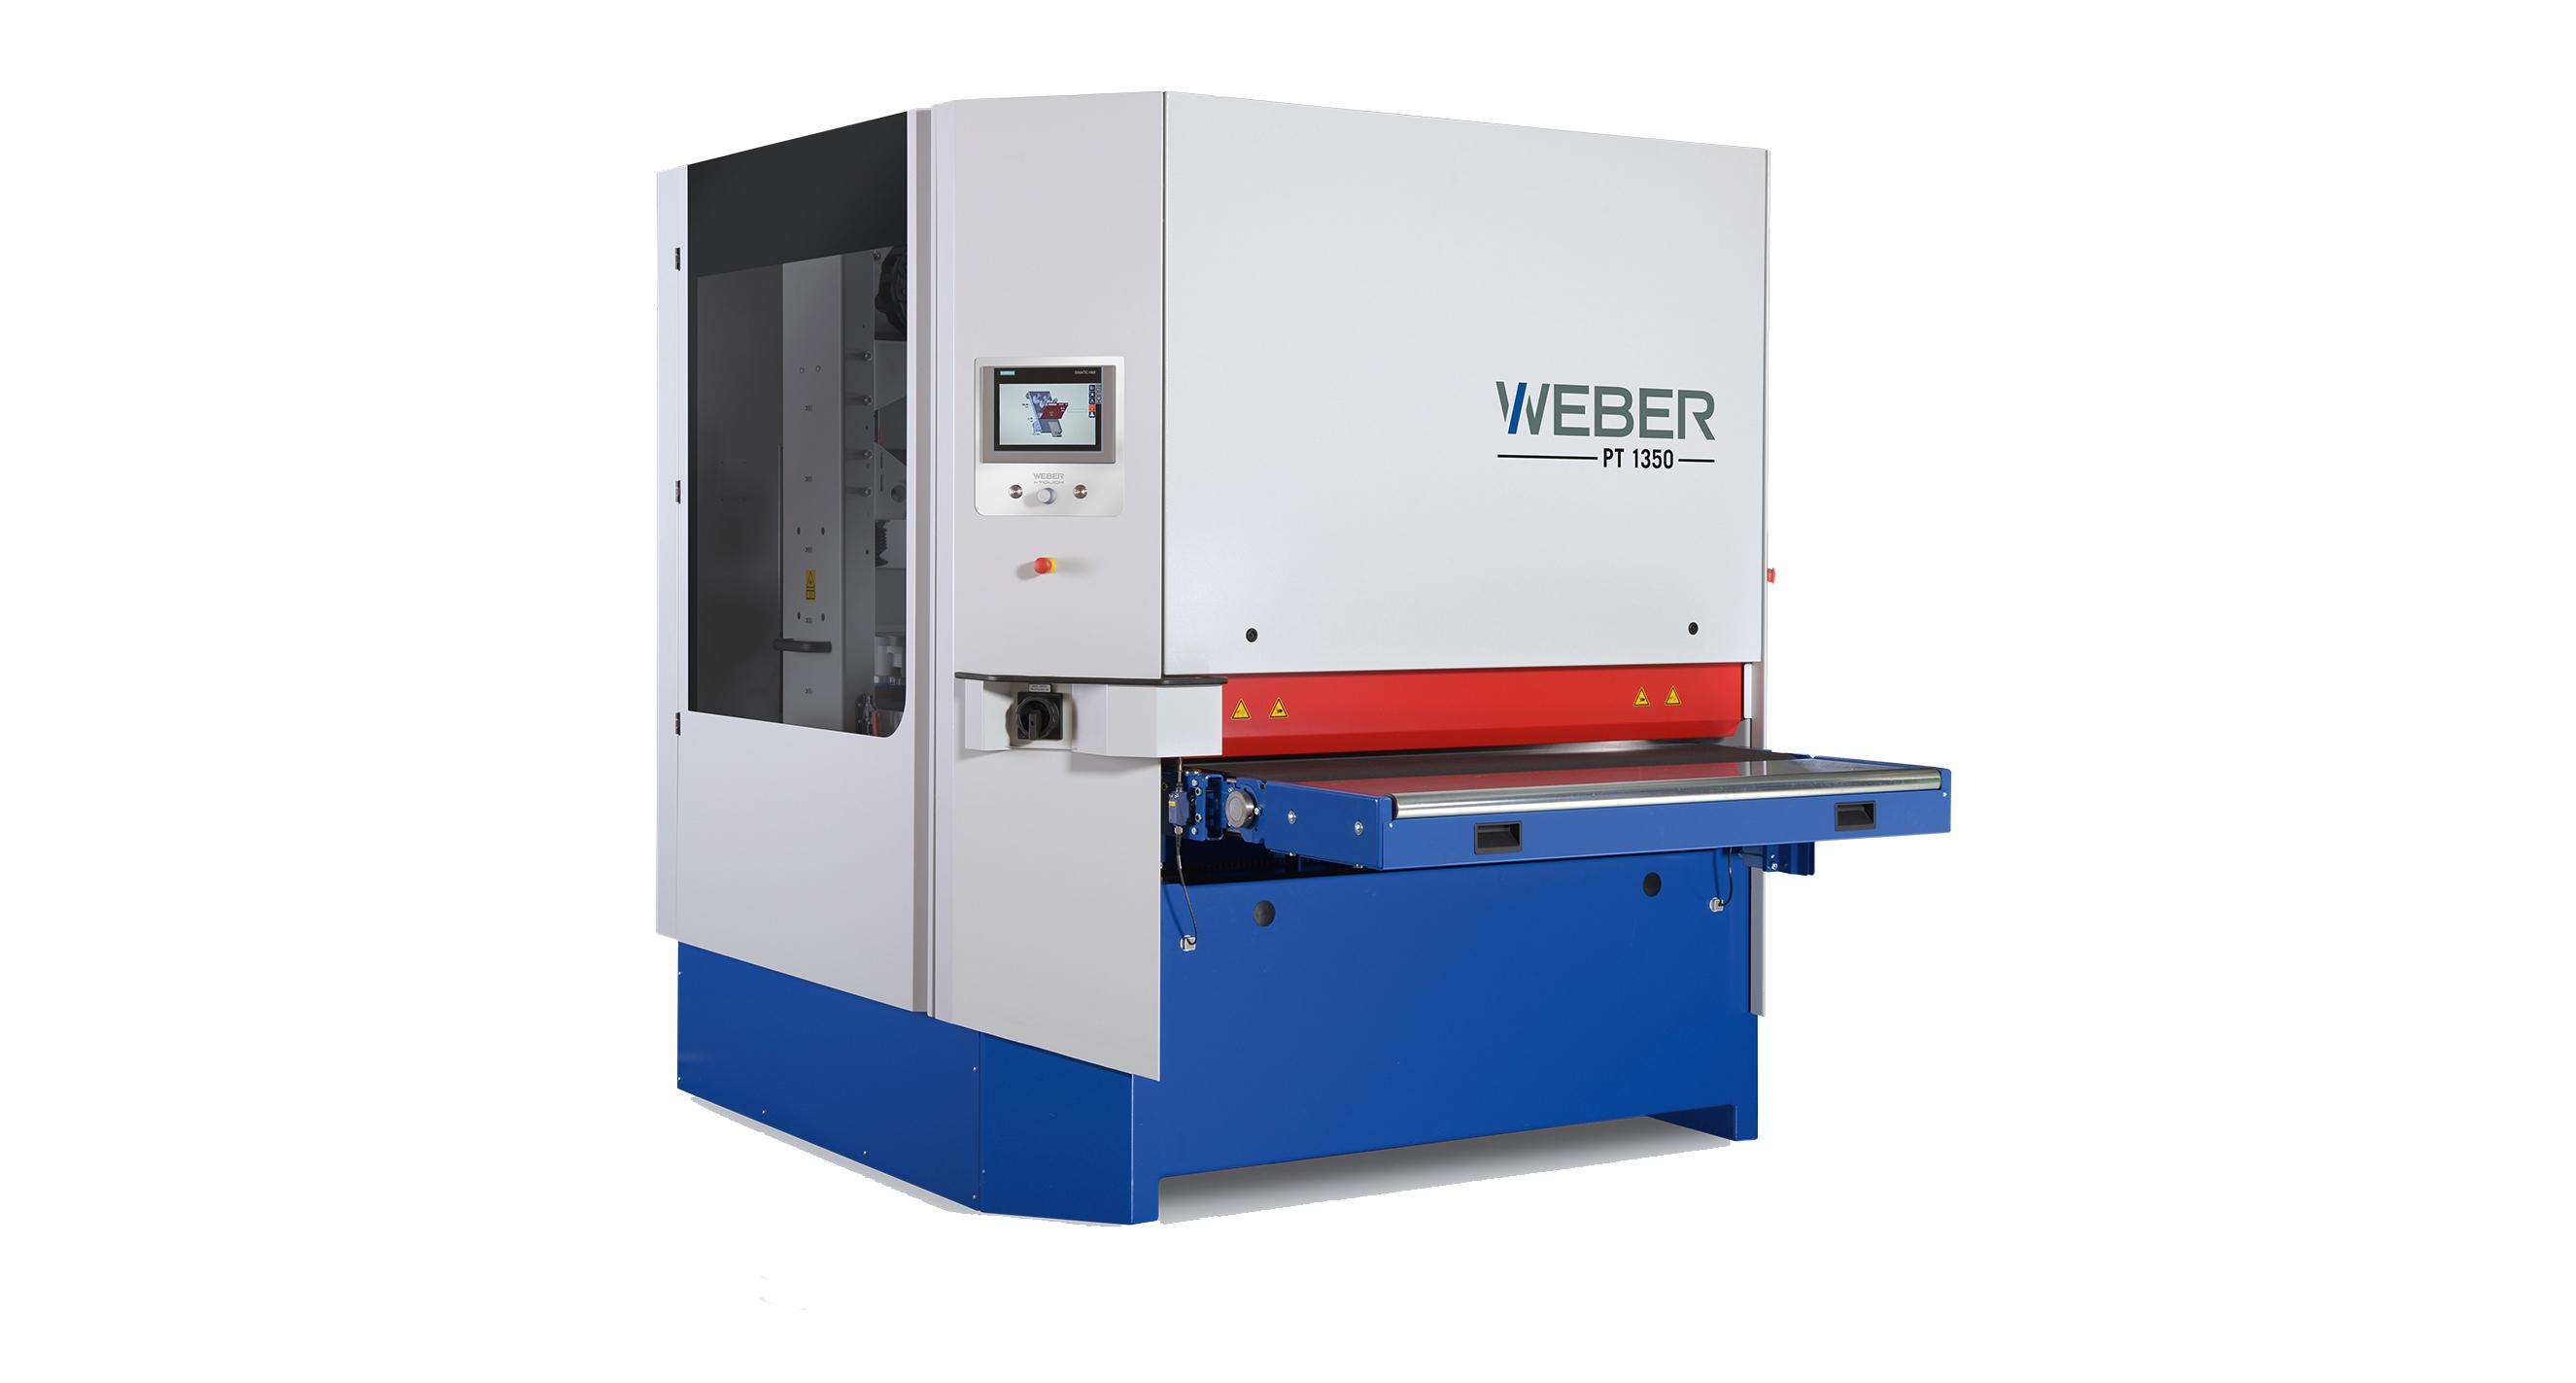 https://crm.appliedmachinery.com.au/uploads/Stocks/images/Weber-PT_Series-94750-a.jpg